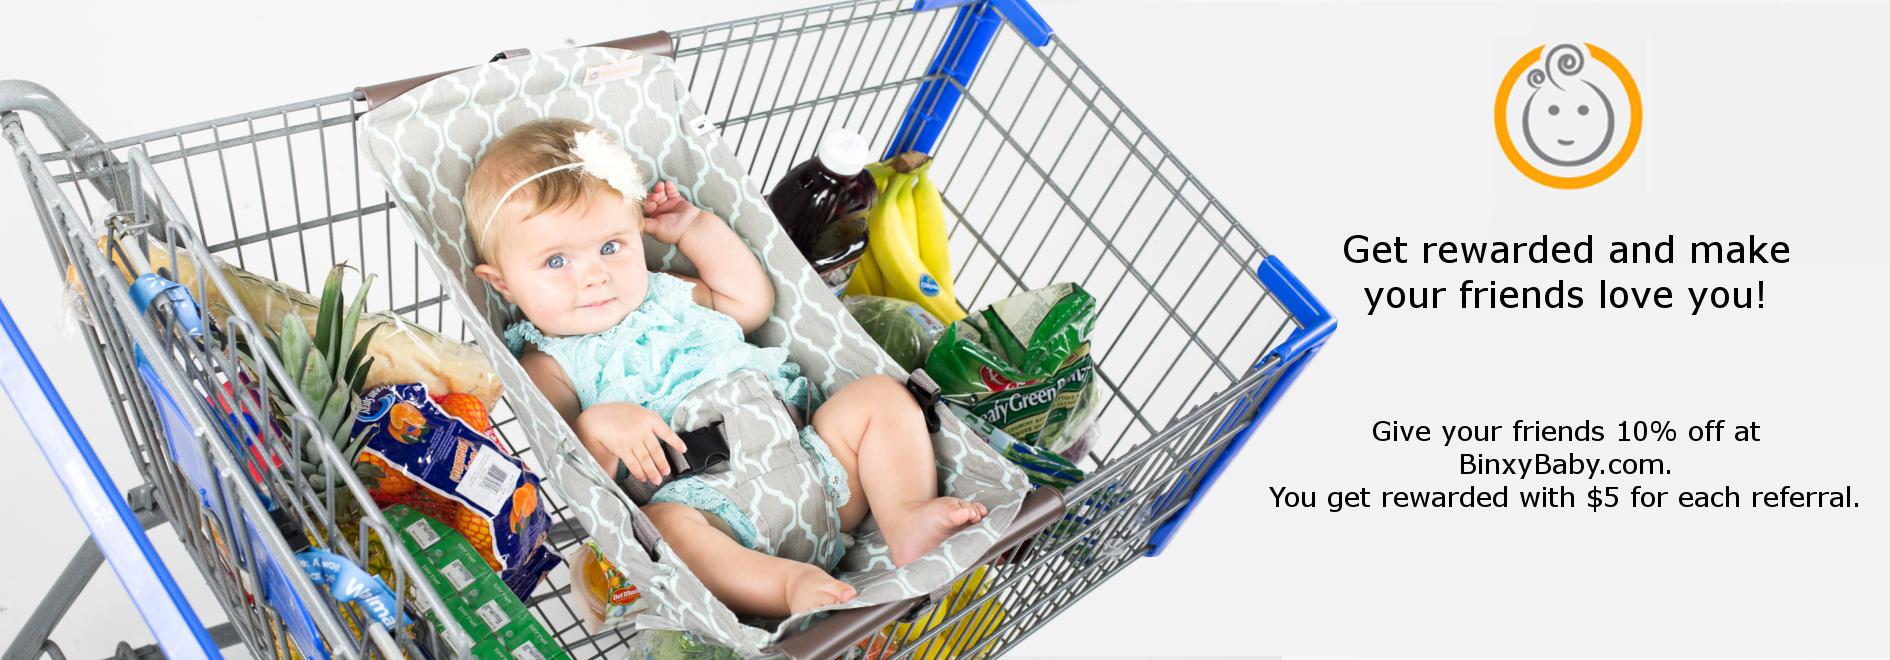 Binxy Baby Referral Program